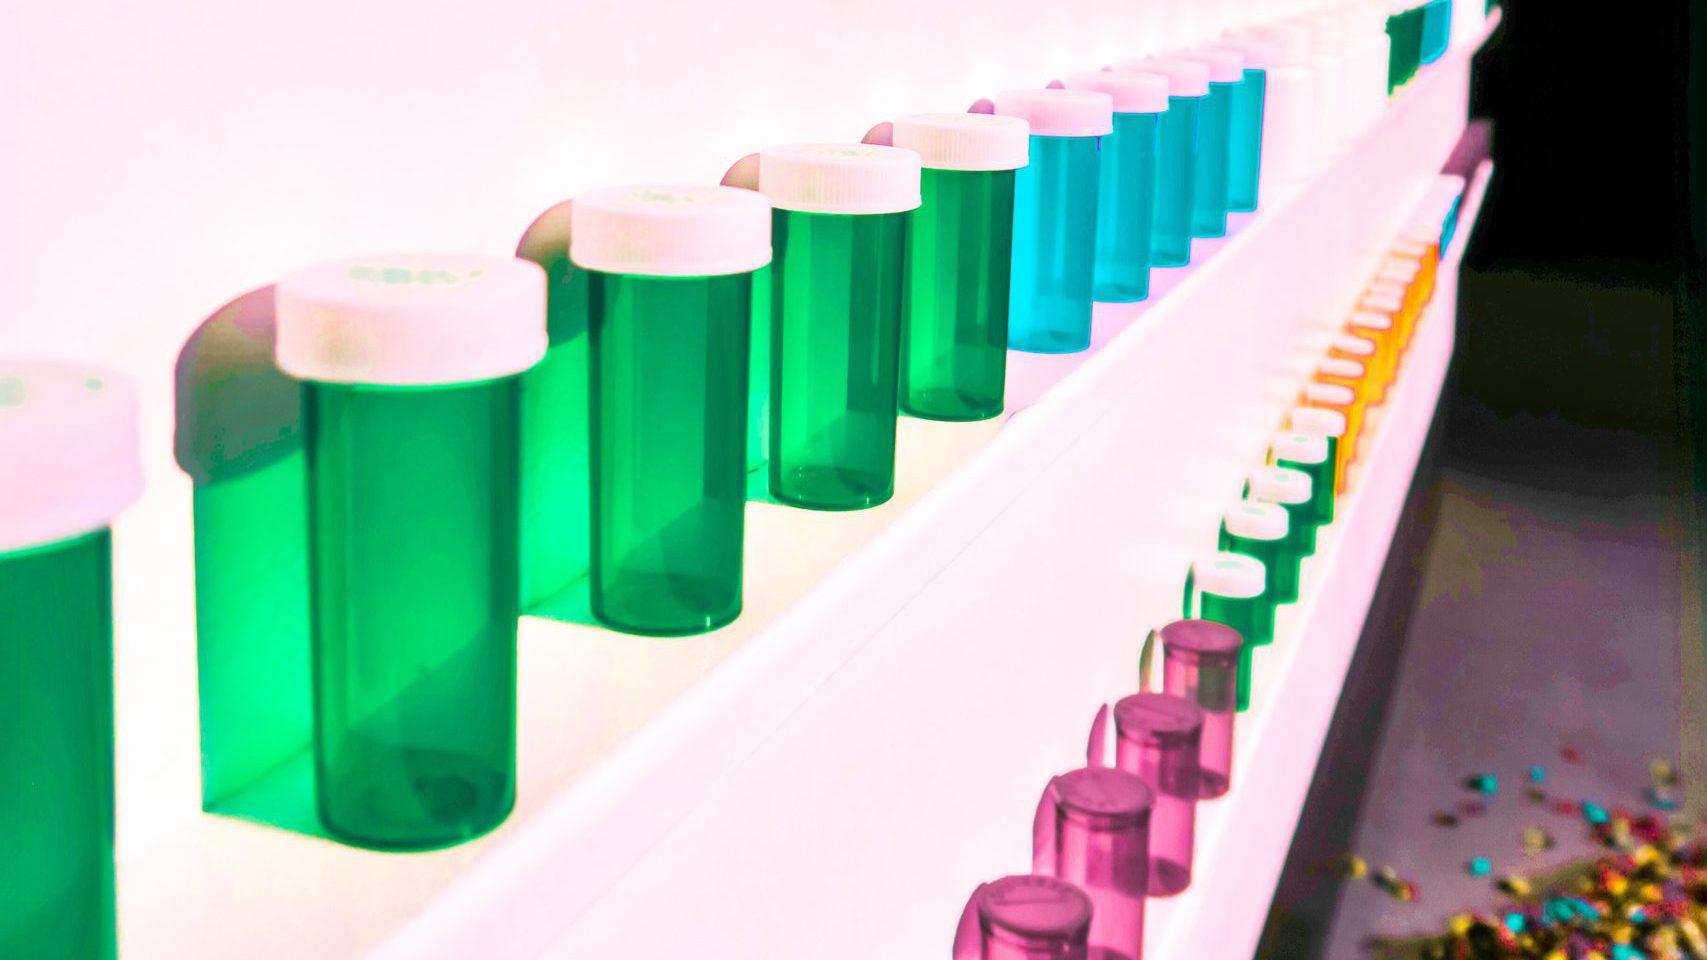 Despite COVID, Pharma Deals Set Records